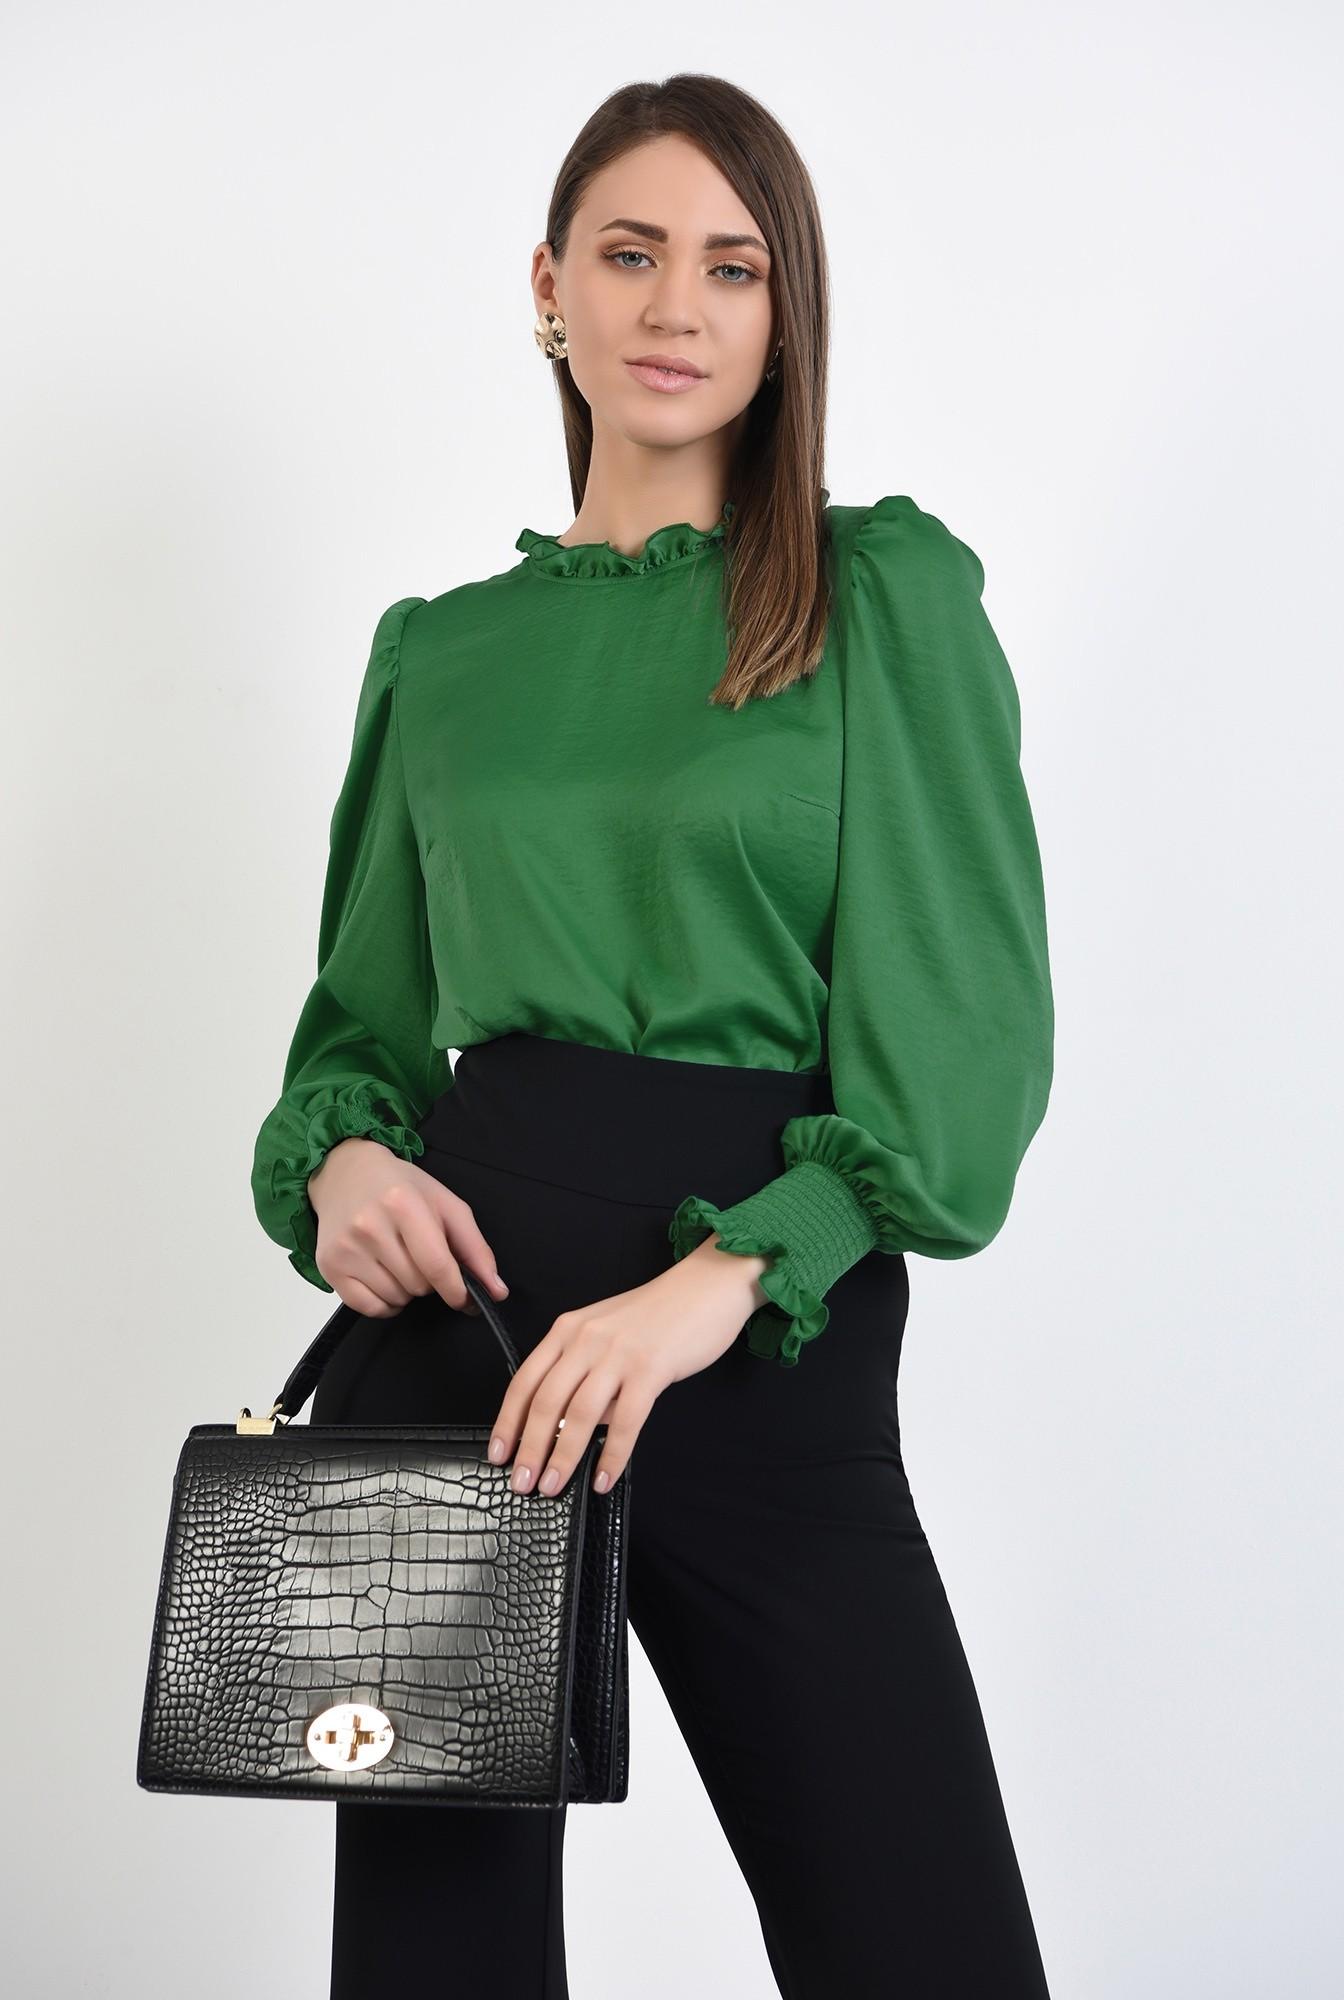 0 - bluza verde, din satin, guler incretit, maneci lungi, butoniera